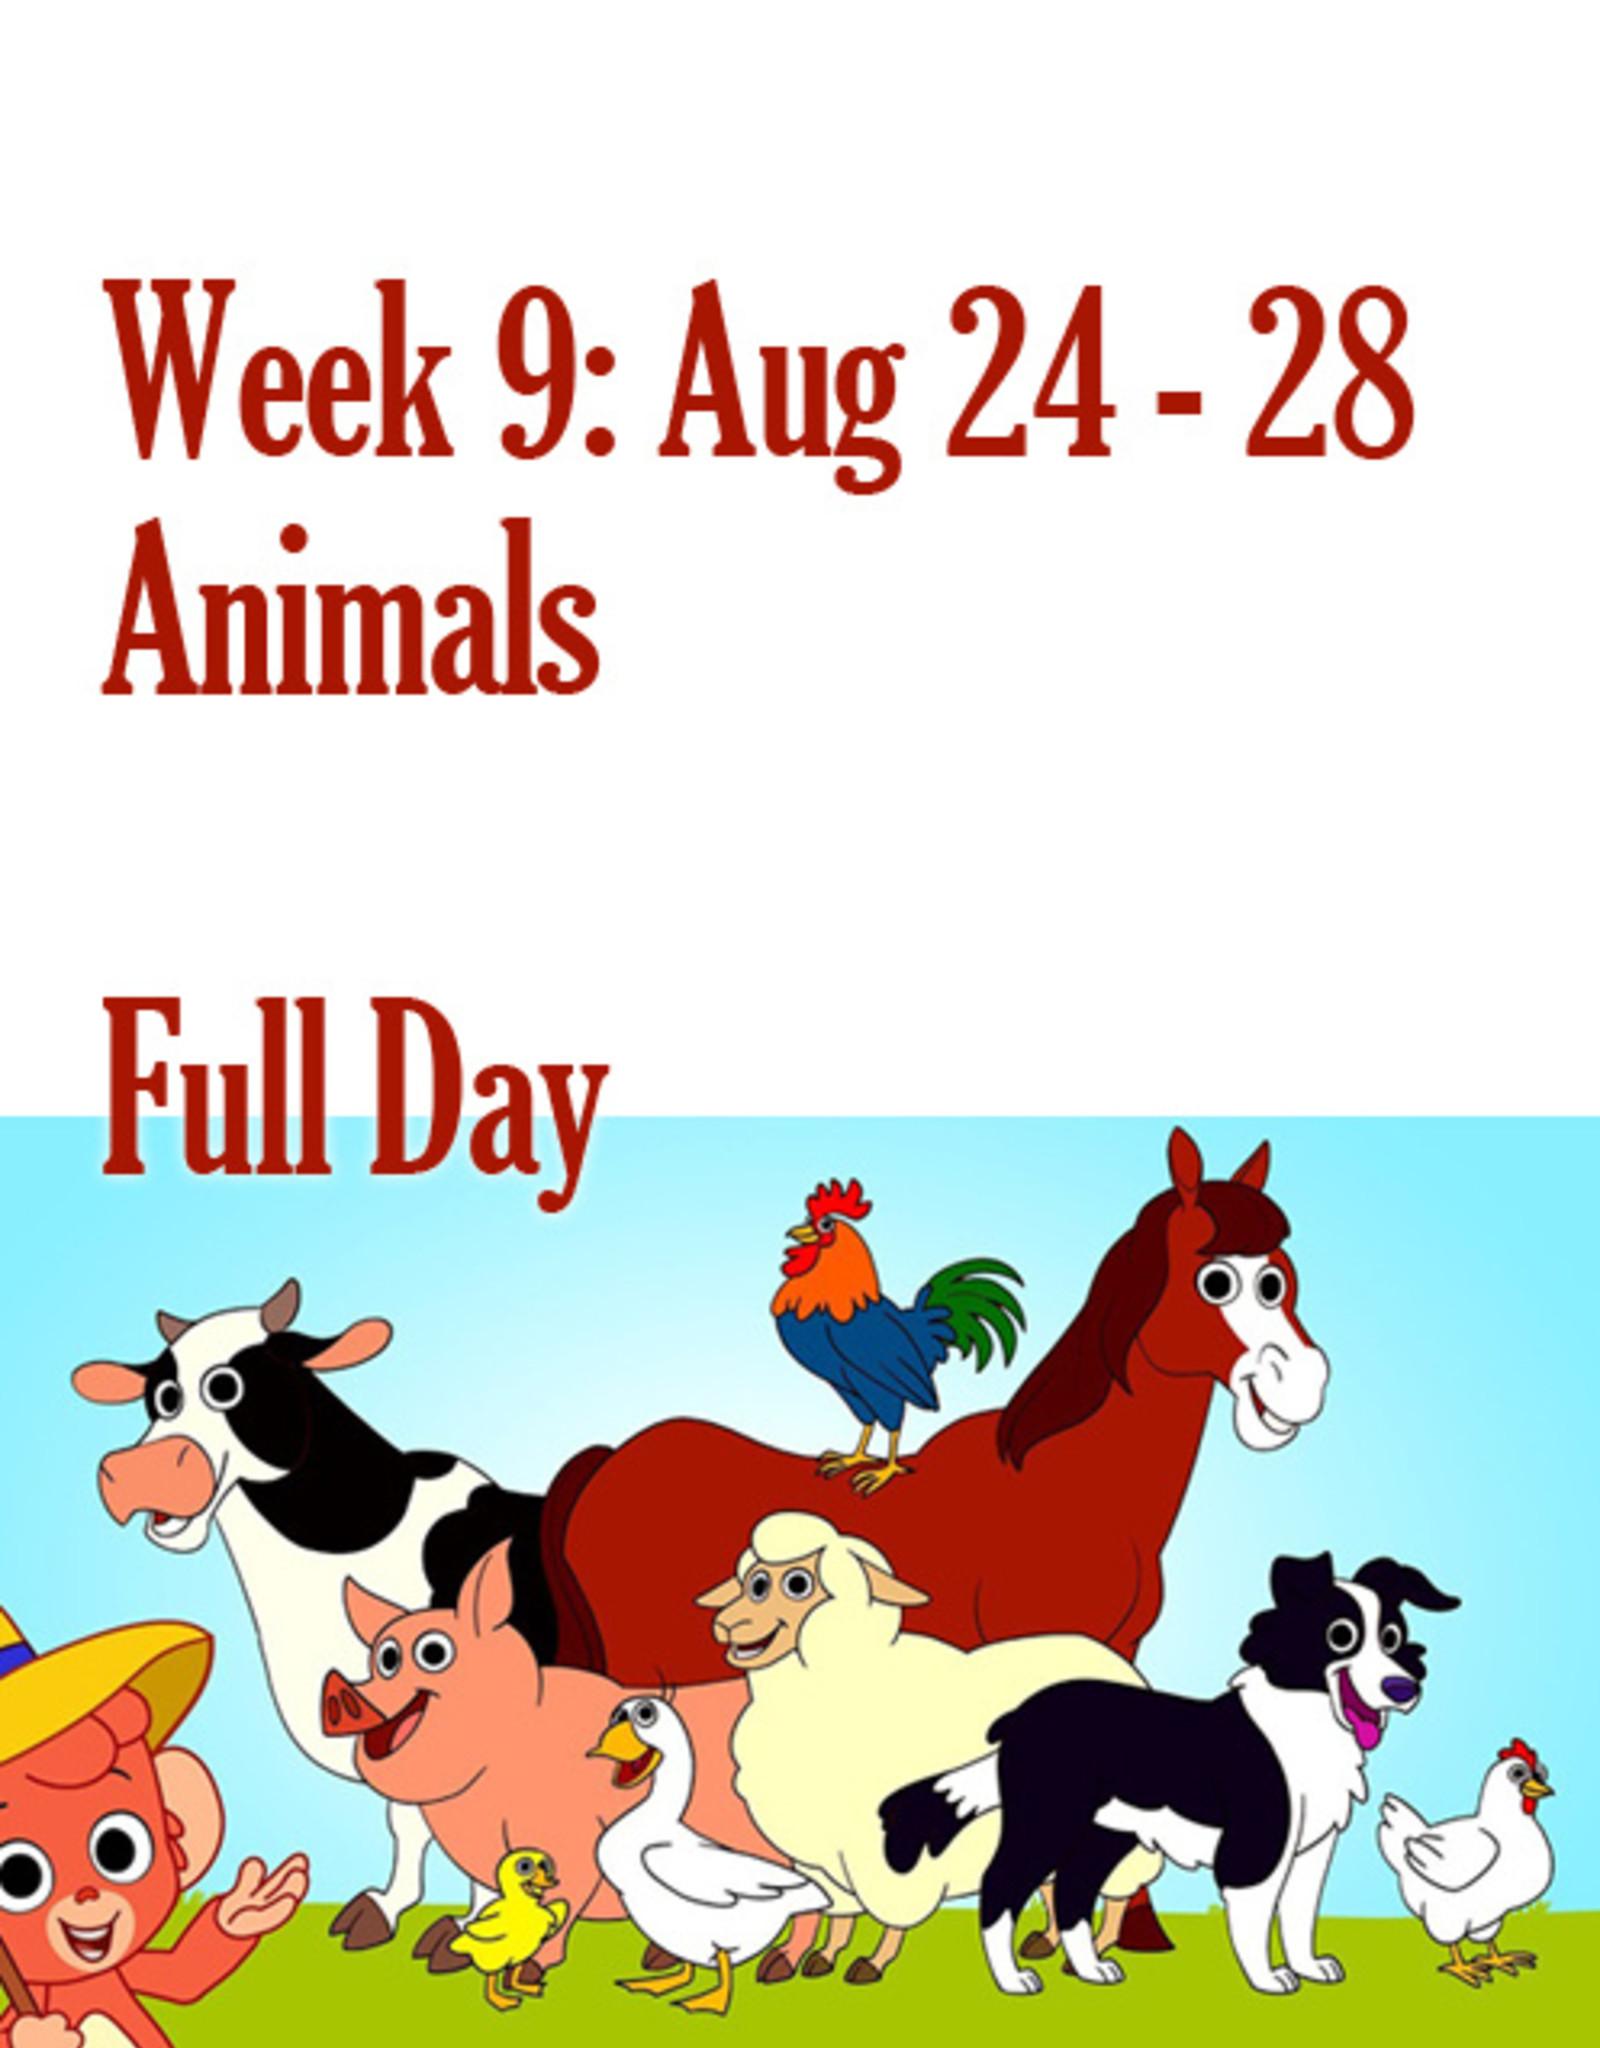 Art Camp Art Camp: Week Nine August 24 - Aug 28 Full Day